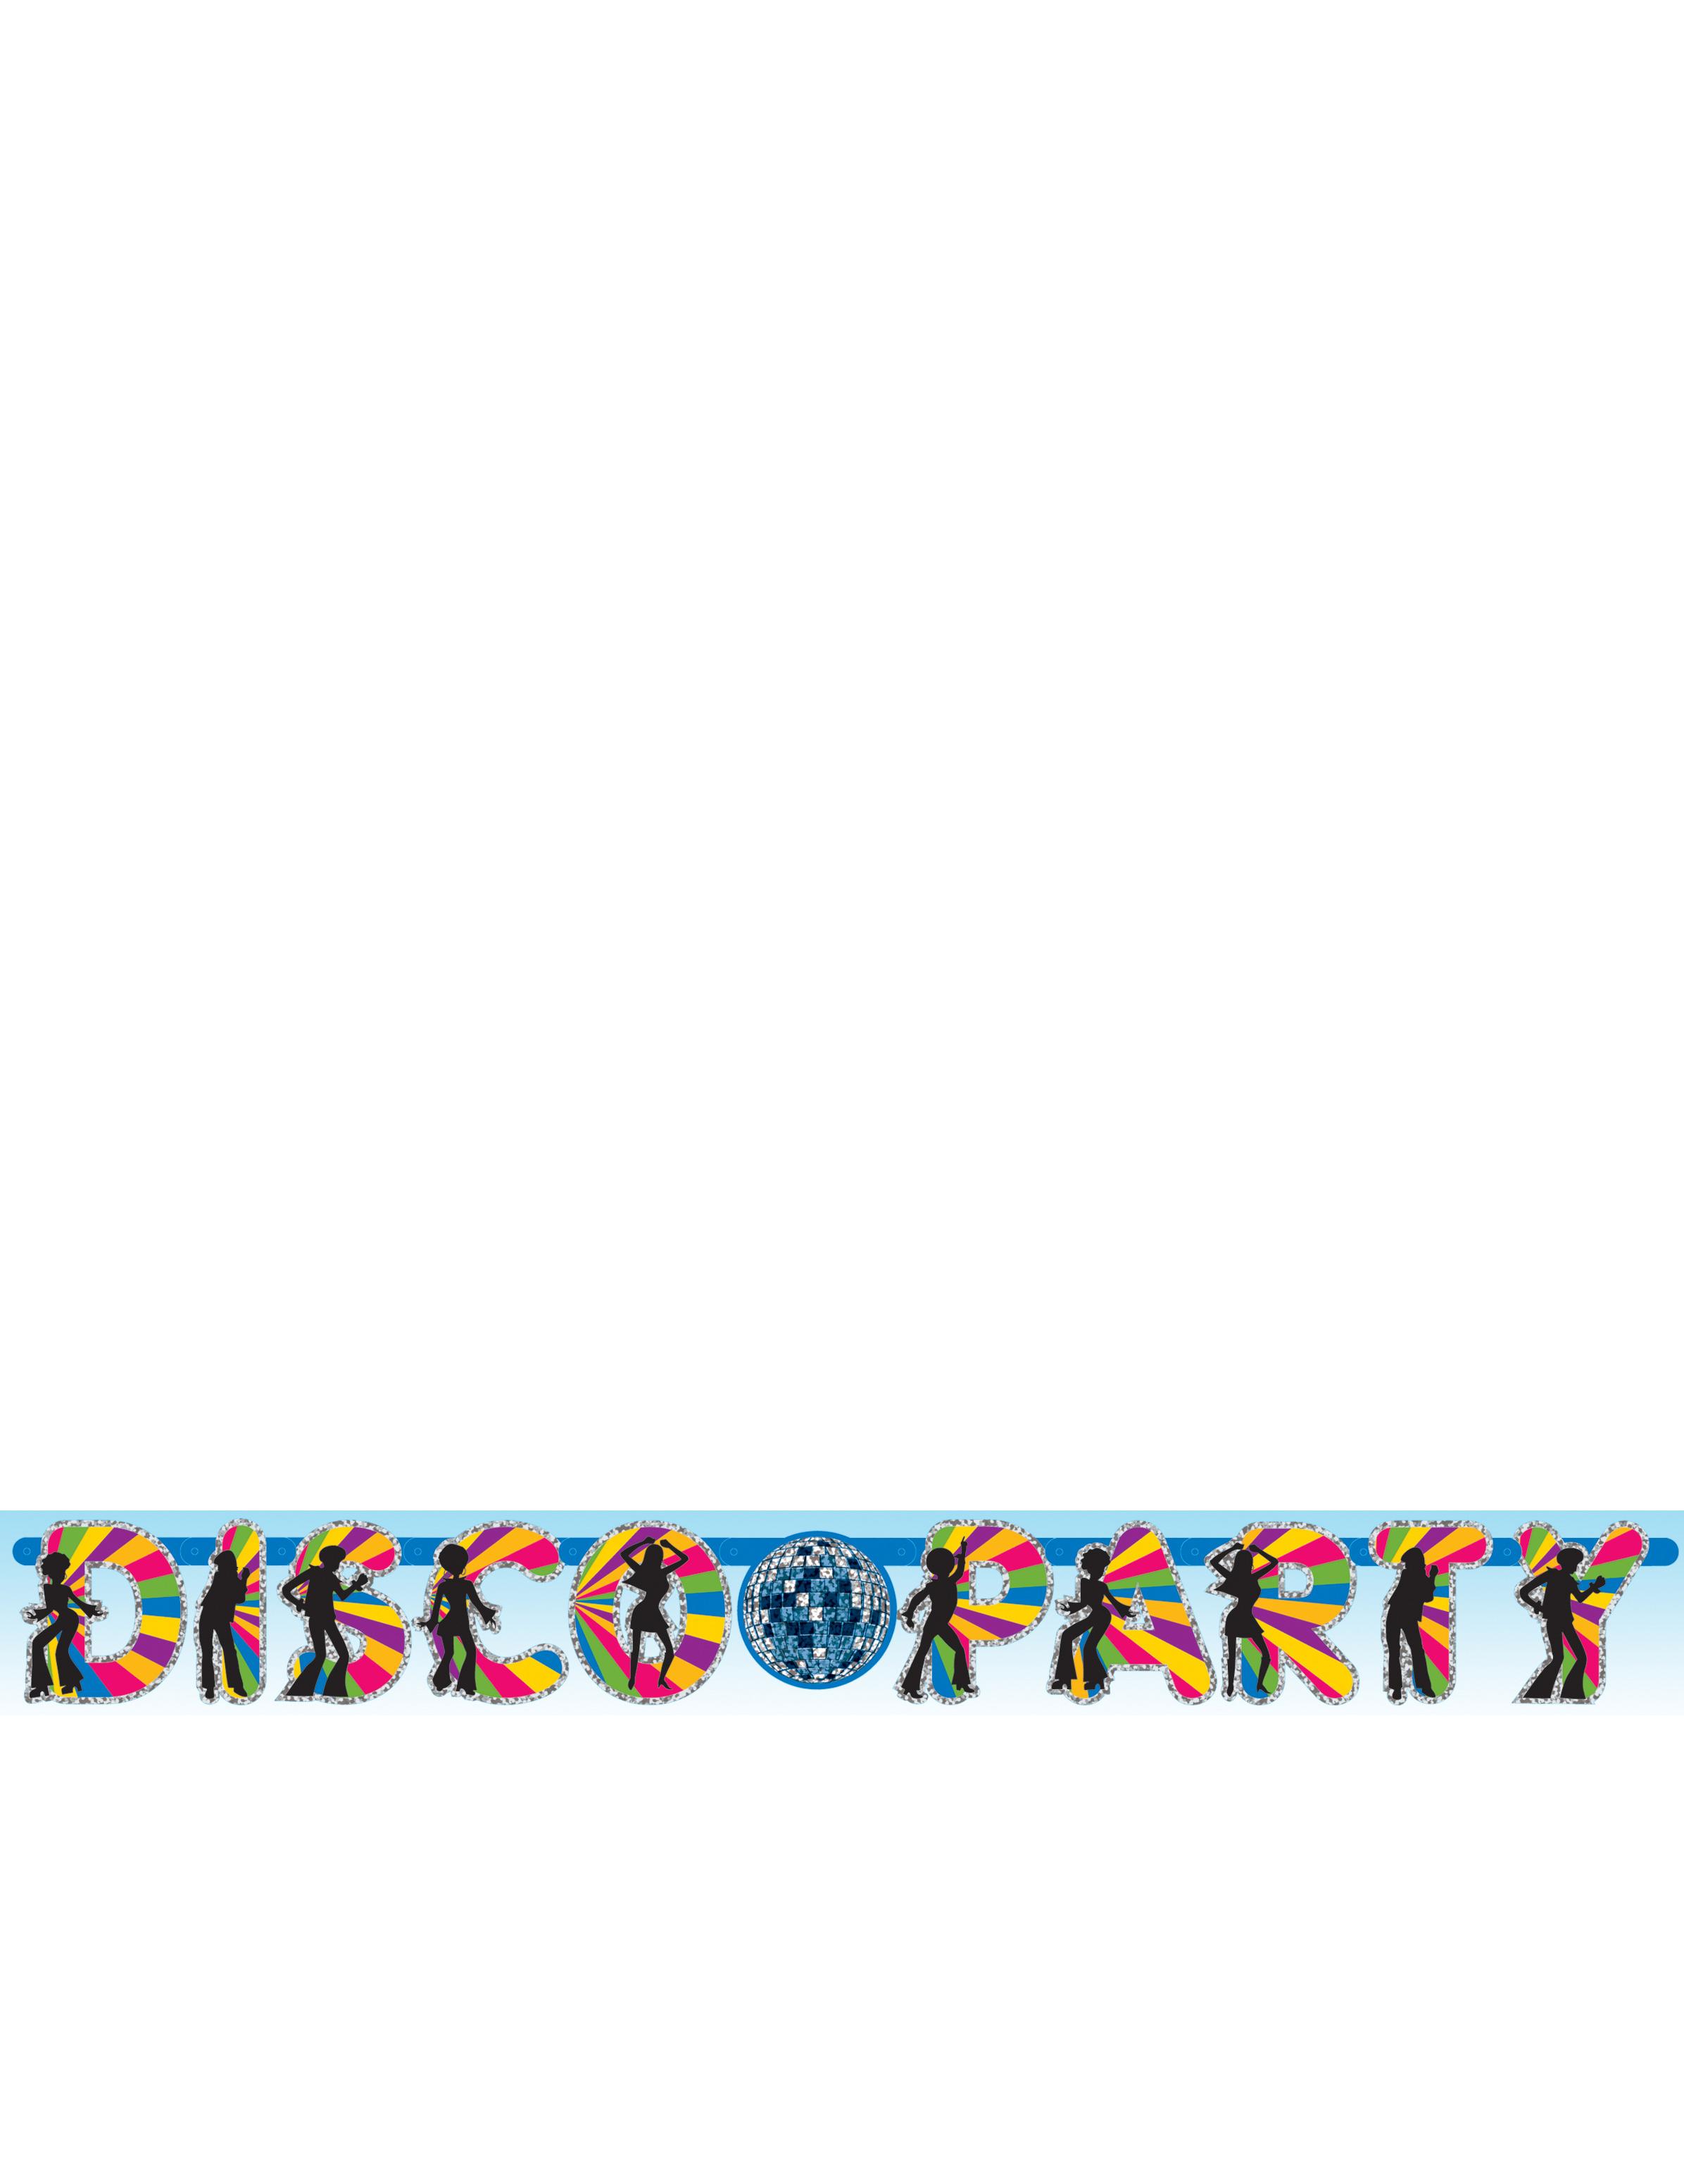 Fabulous Disco Party Banner 2392 x 1772 · 391 kB · jpeg